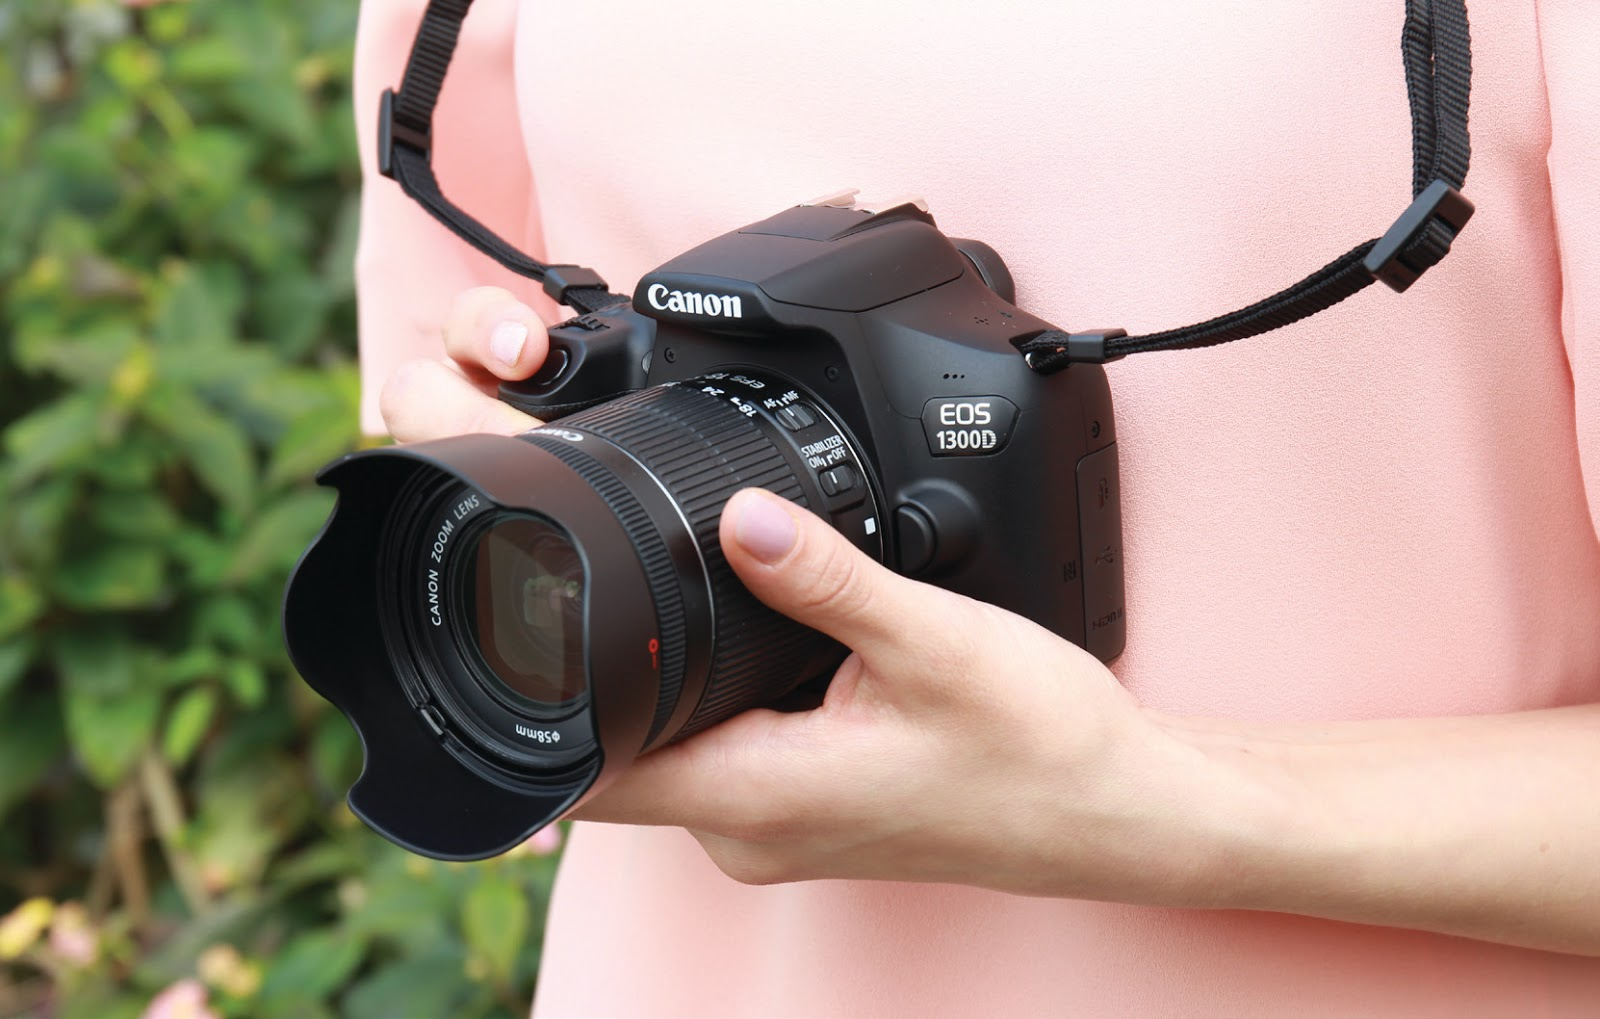 Harga Bekas Kamera Dslr Canon 1300d No Box Terbaru Blog Banten Kamera